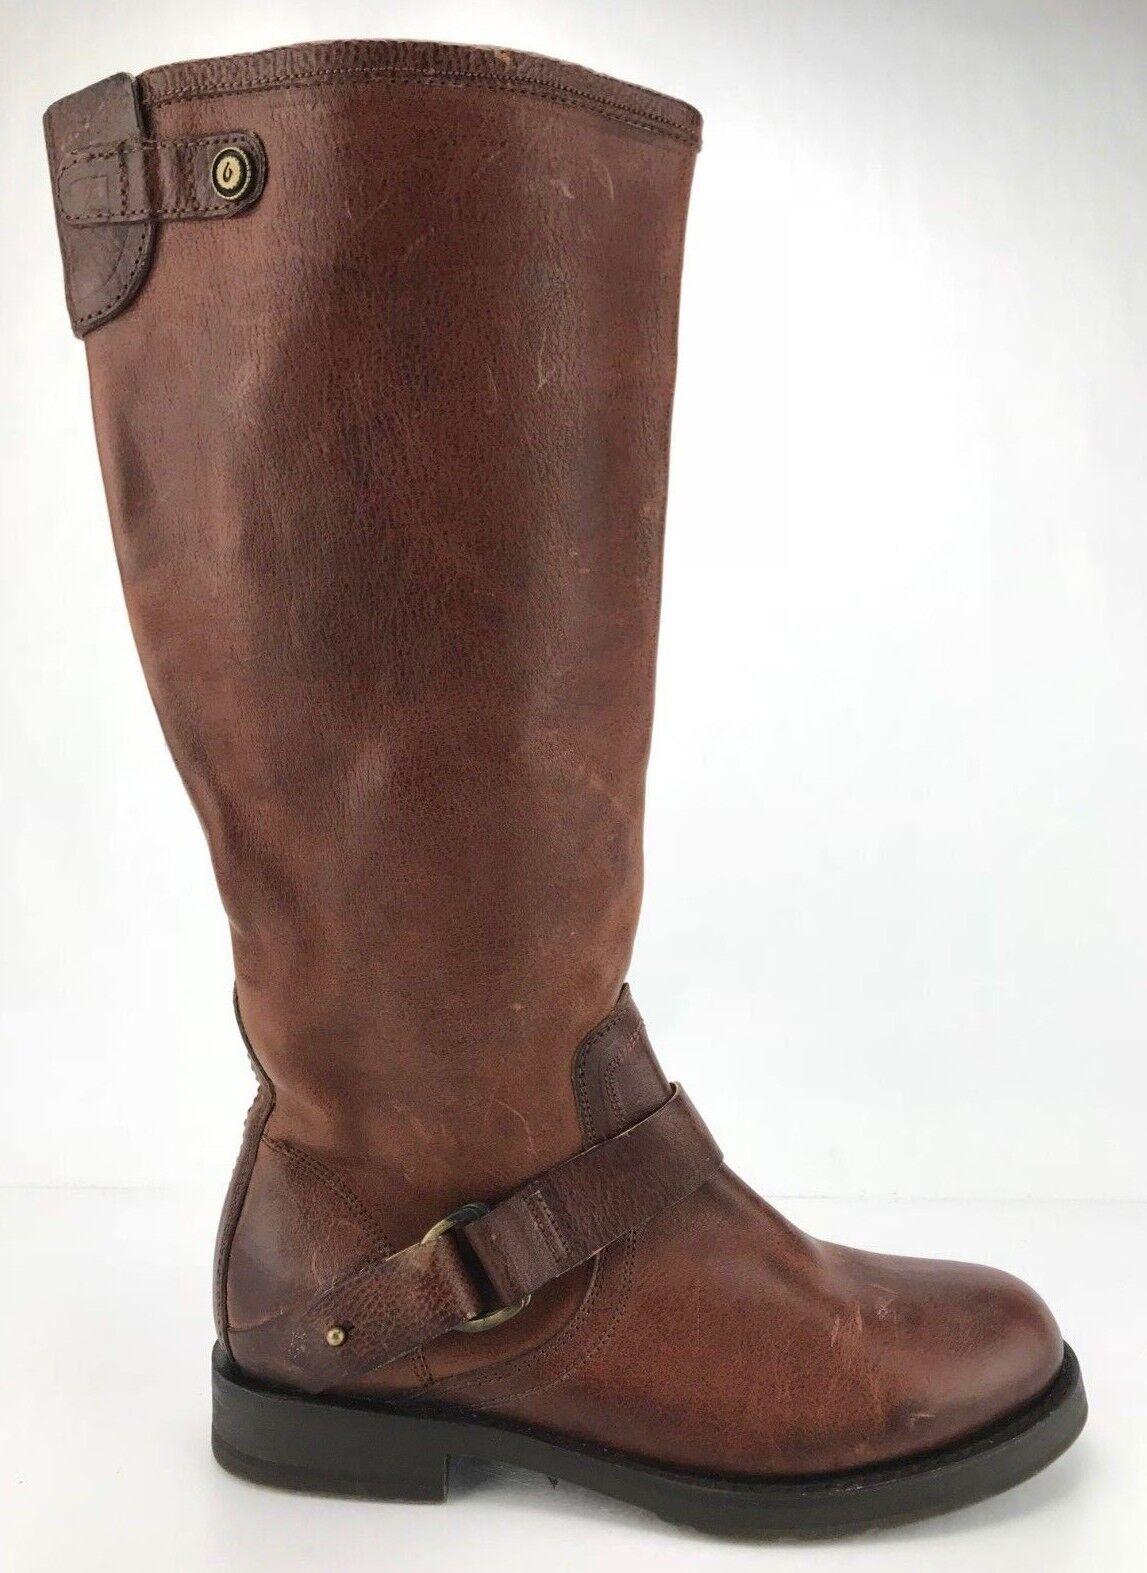 garantito Olukai Nahuku Nahuku Nahuku Equestrian avvio Marrone Leather Calf High Side Zipper donna Dimensione 7  vendita online sconto prezzo basso